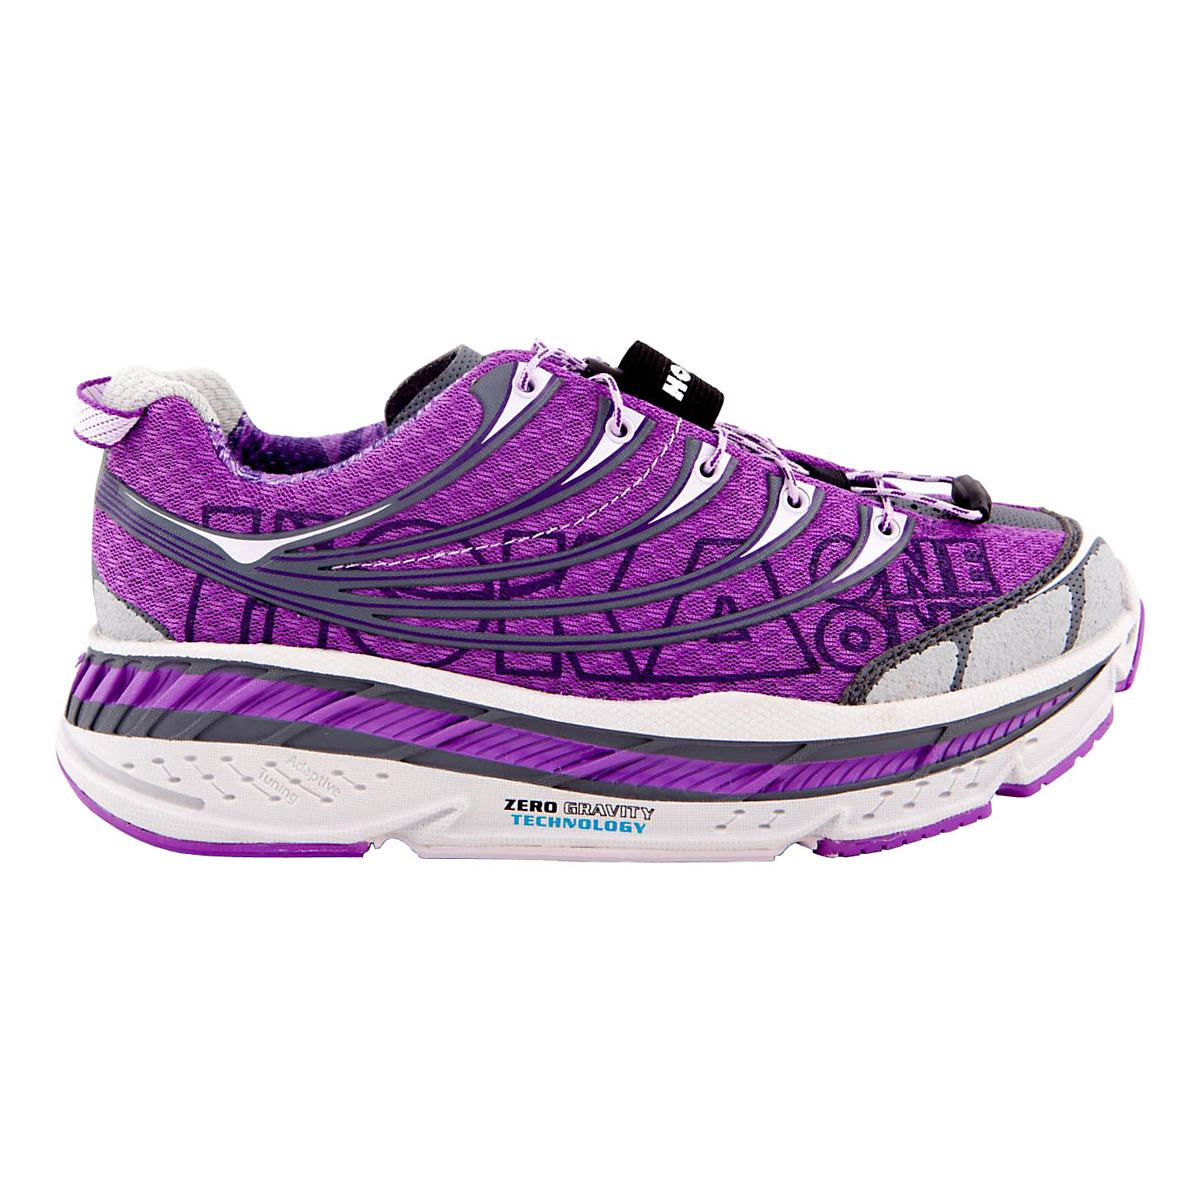 98eb48f8dca Womens Hoka One One Stinson Tarmac Running Shoe at Road Runner Sports